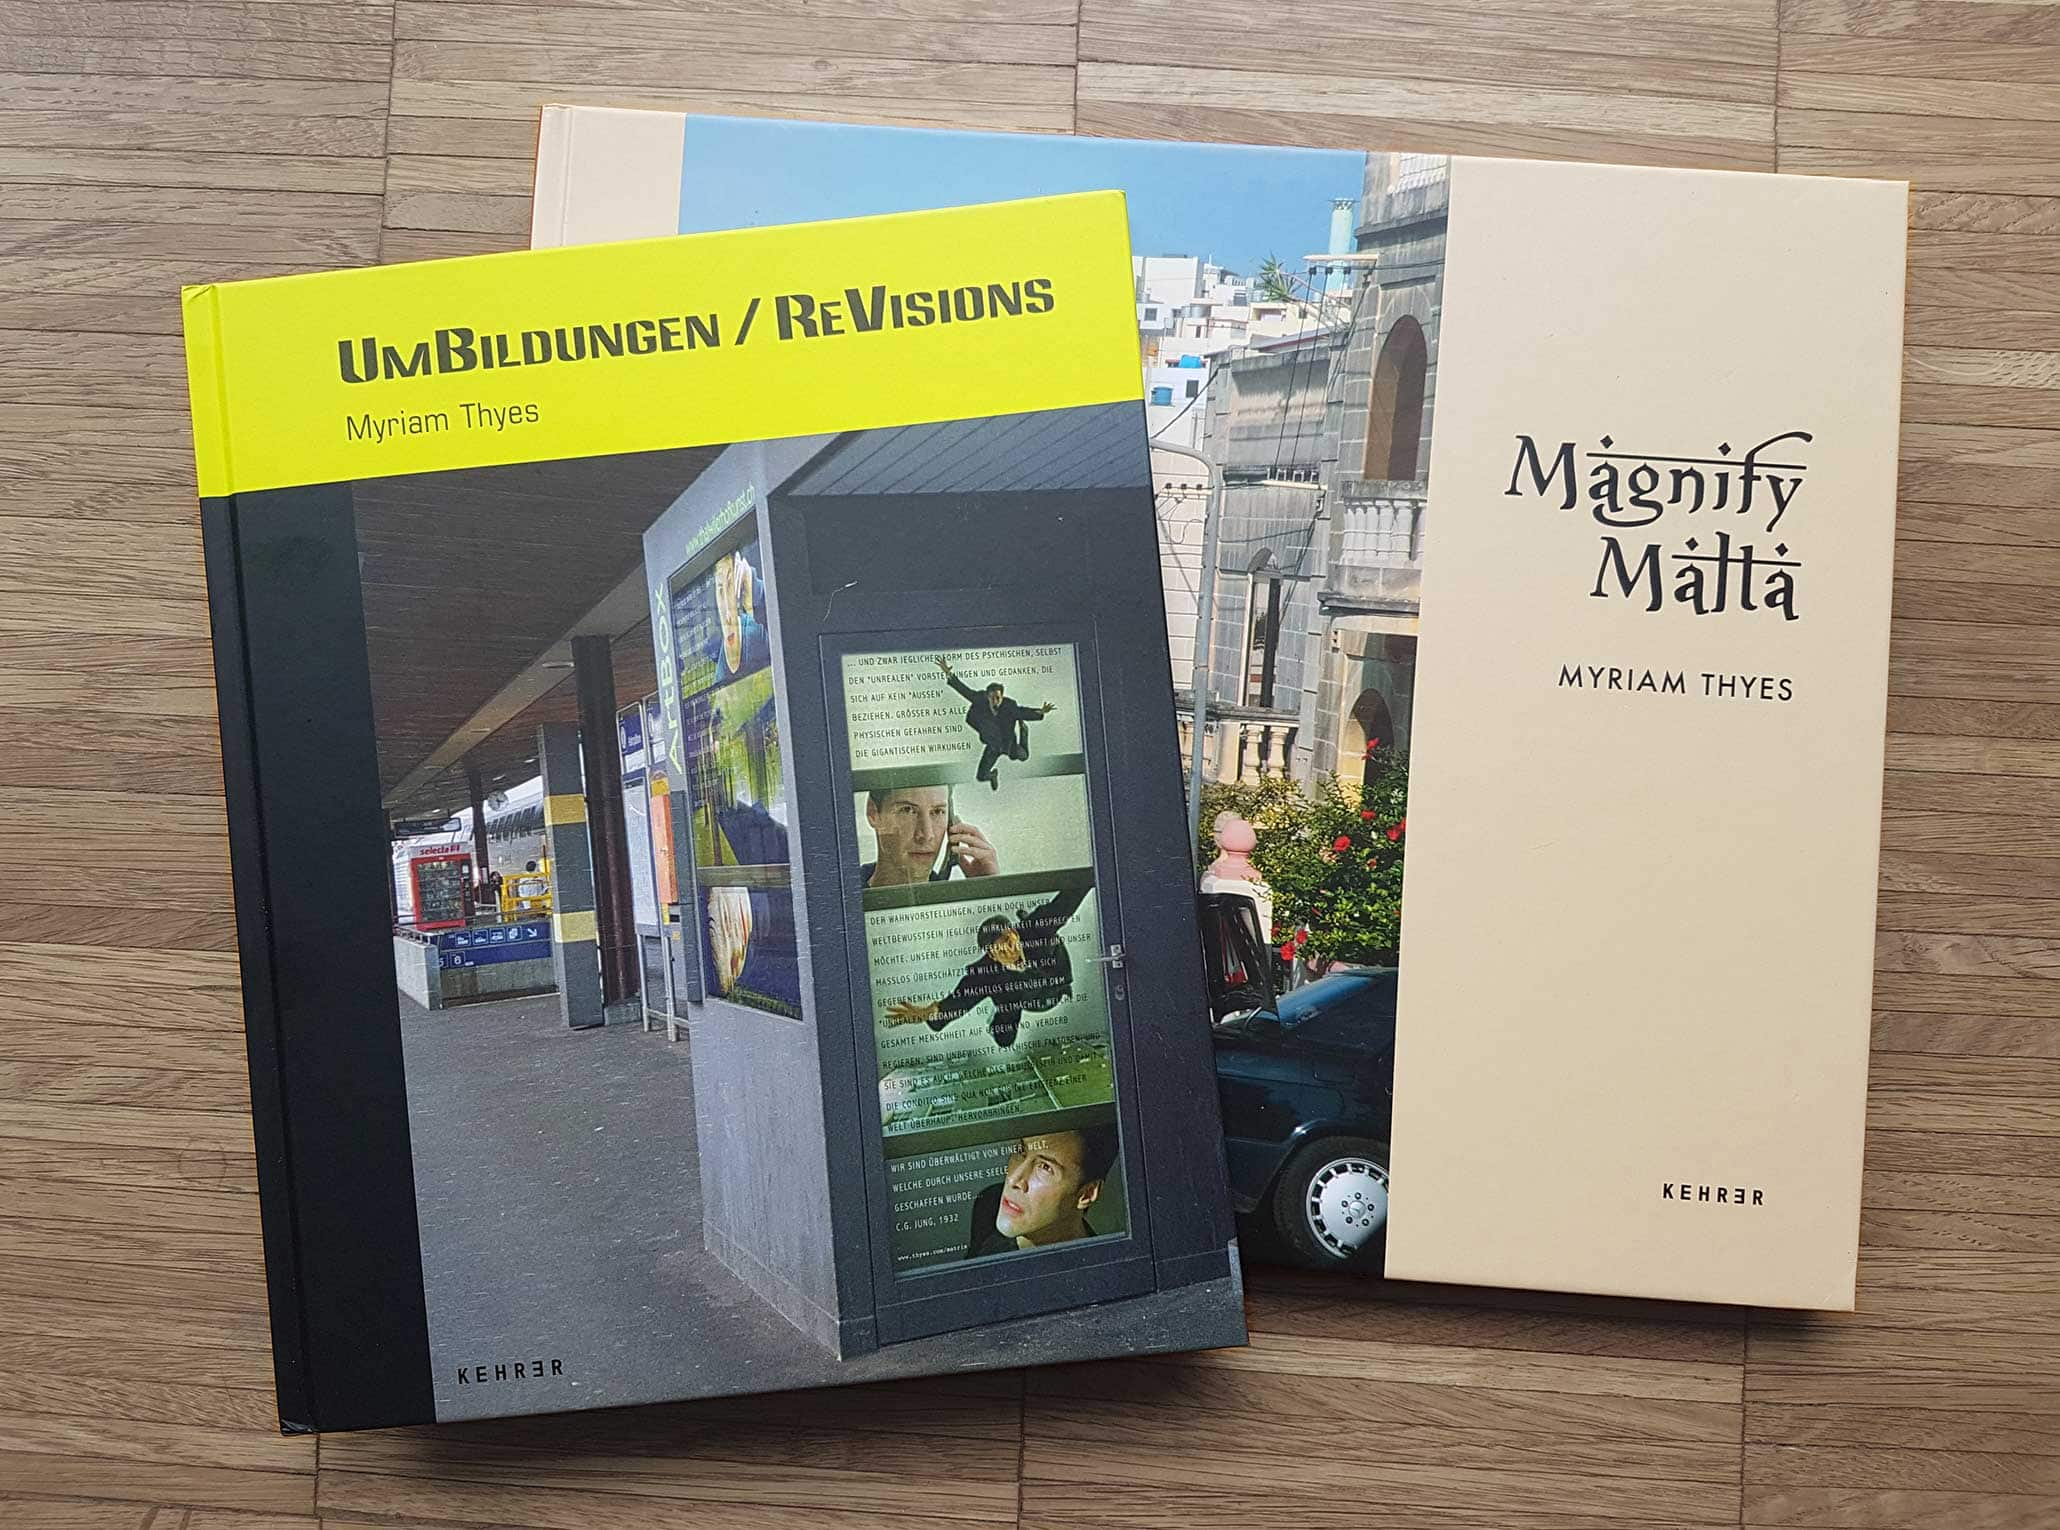 Myriam Thyes Bibliografie